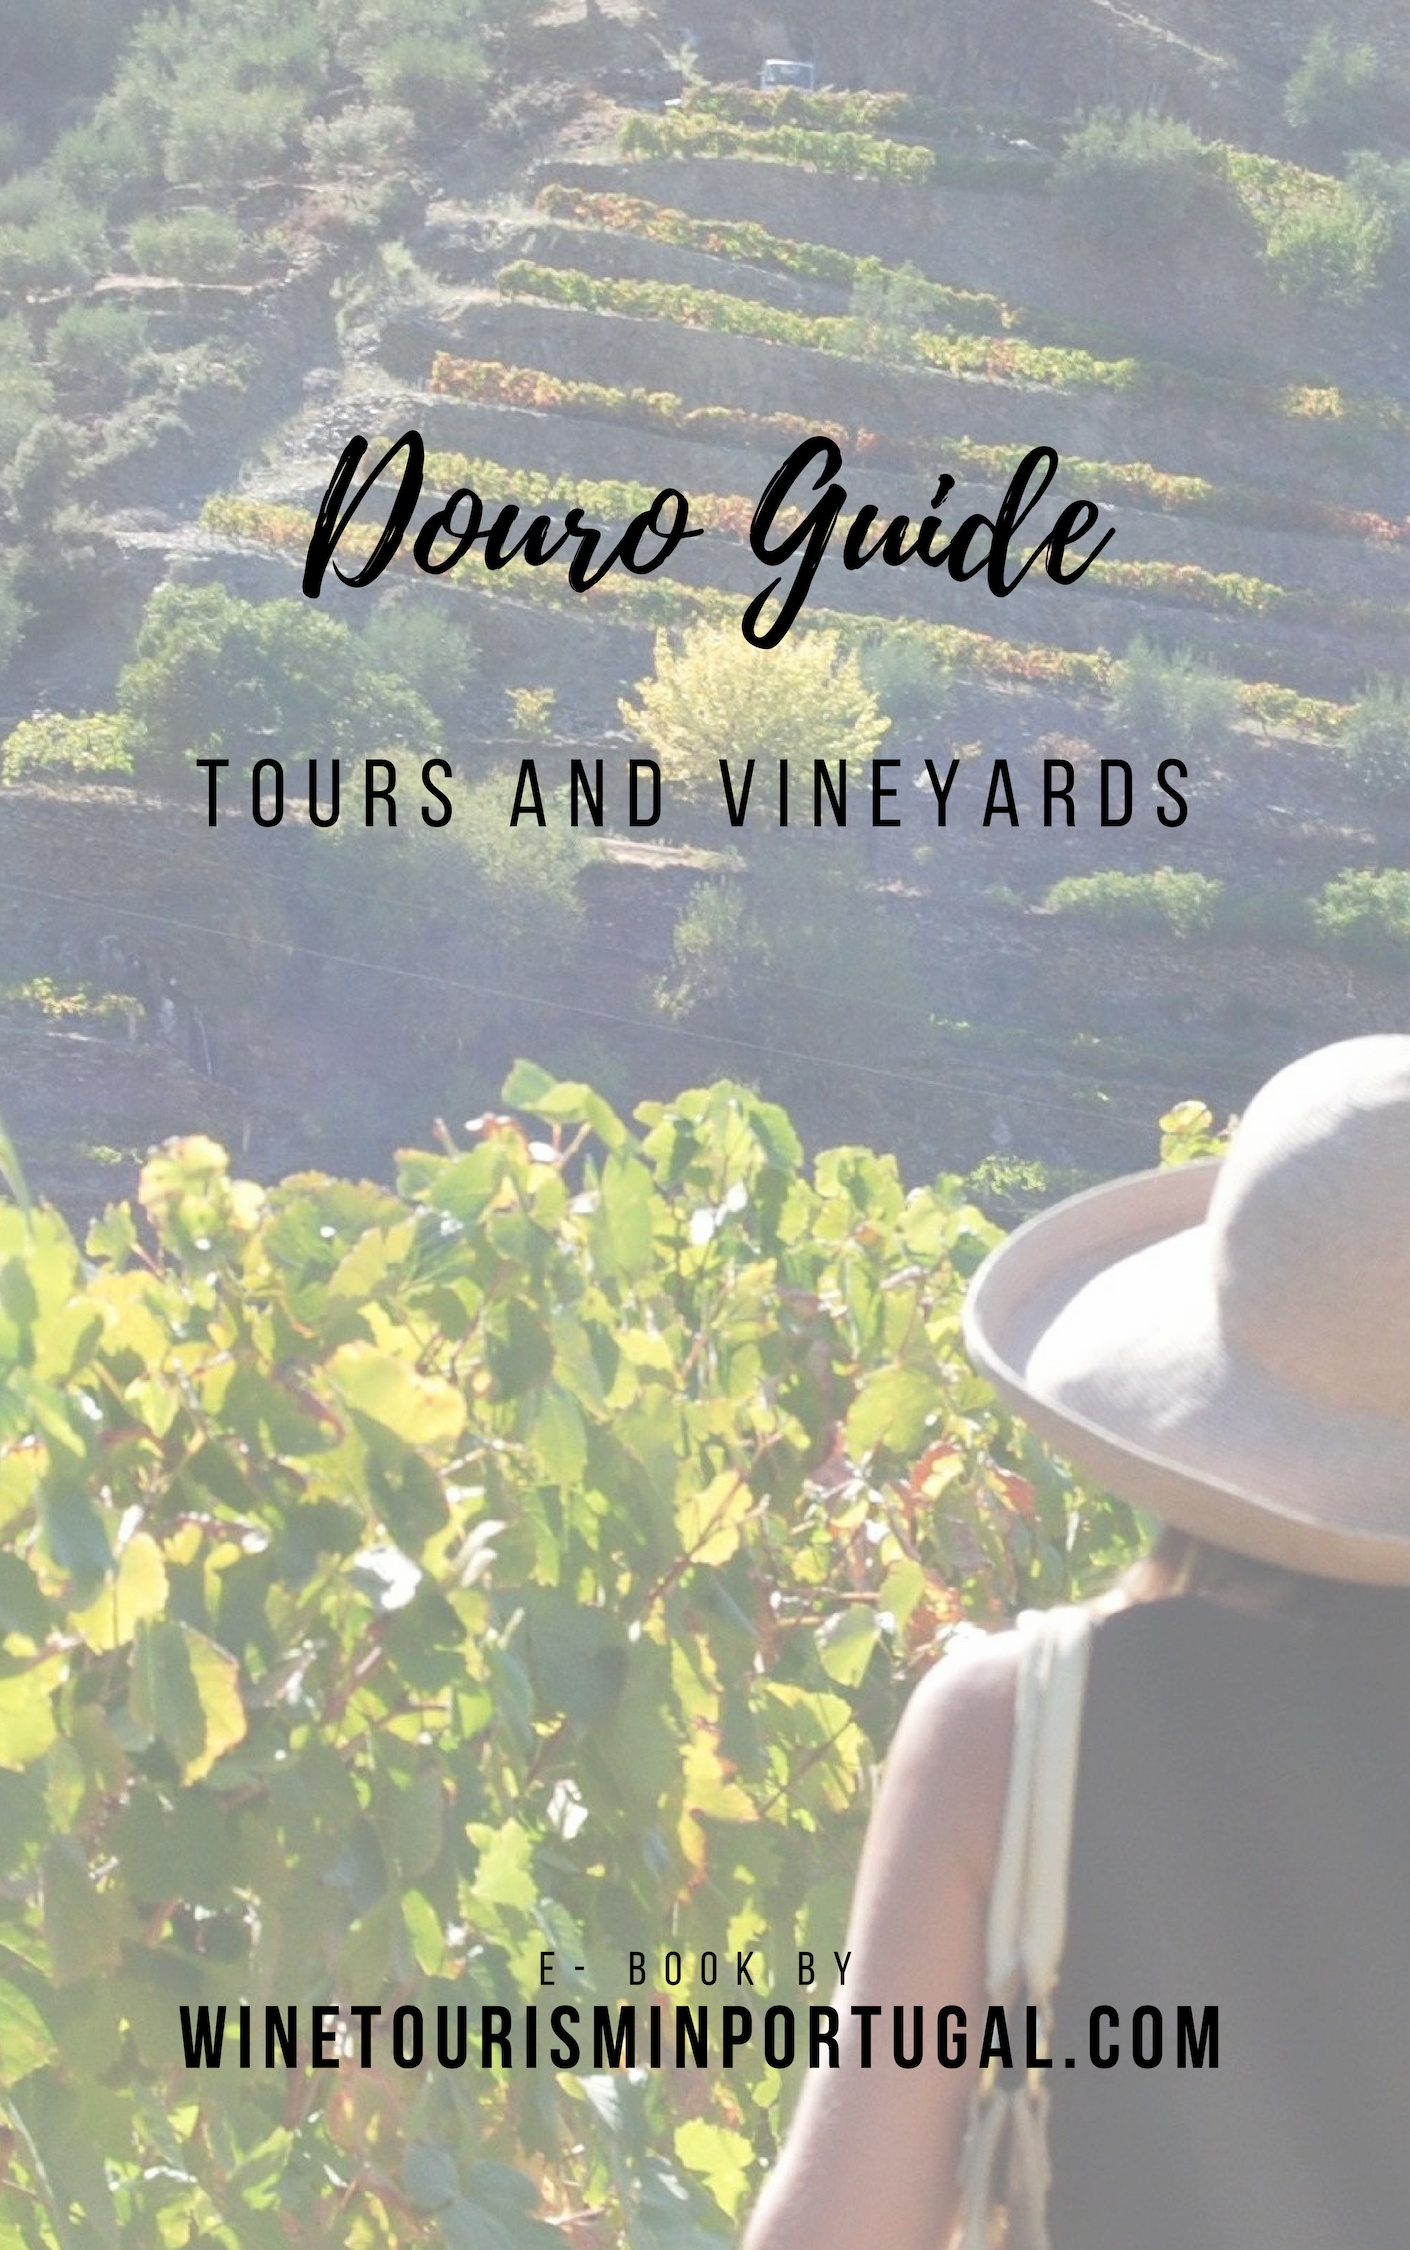 E-book Douro Guide - Vines and Vineyards